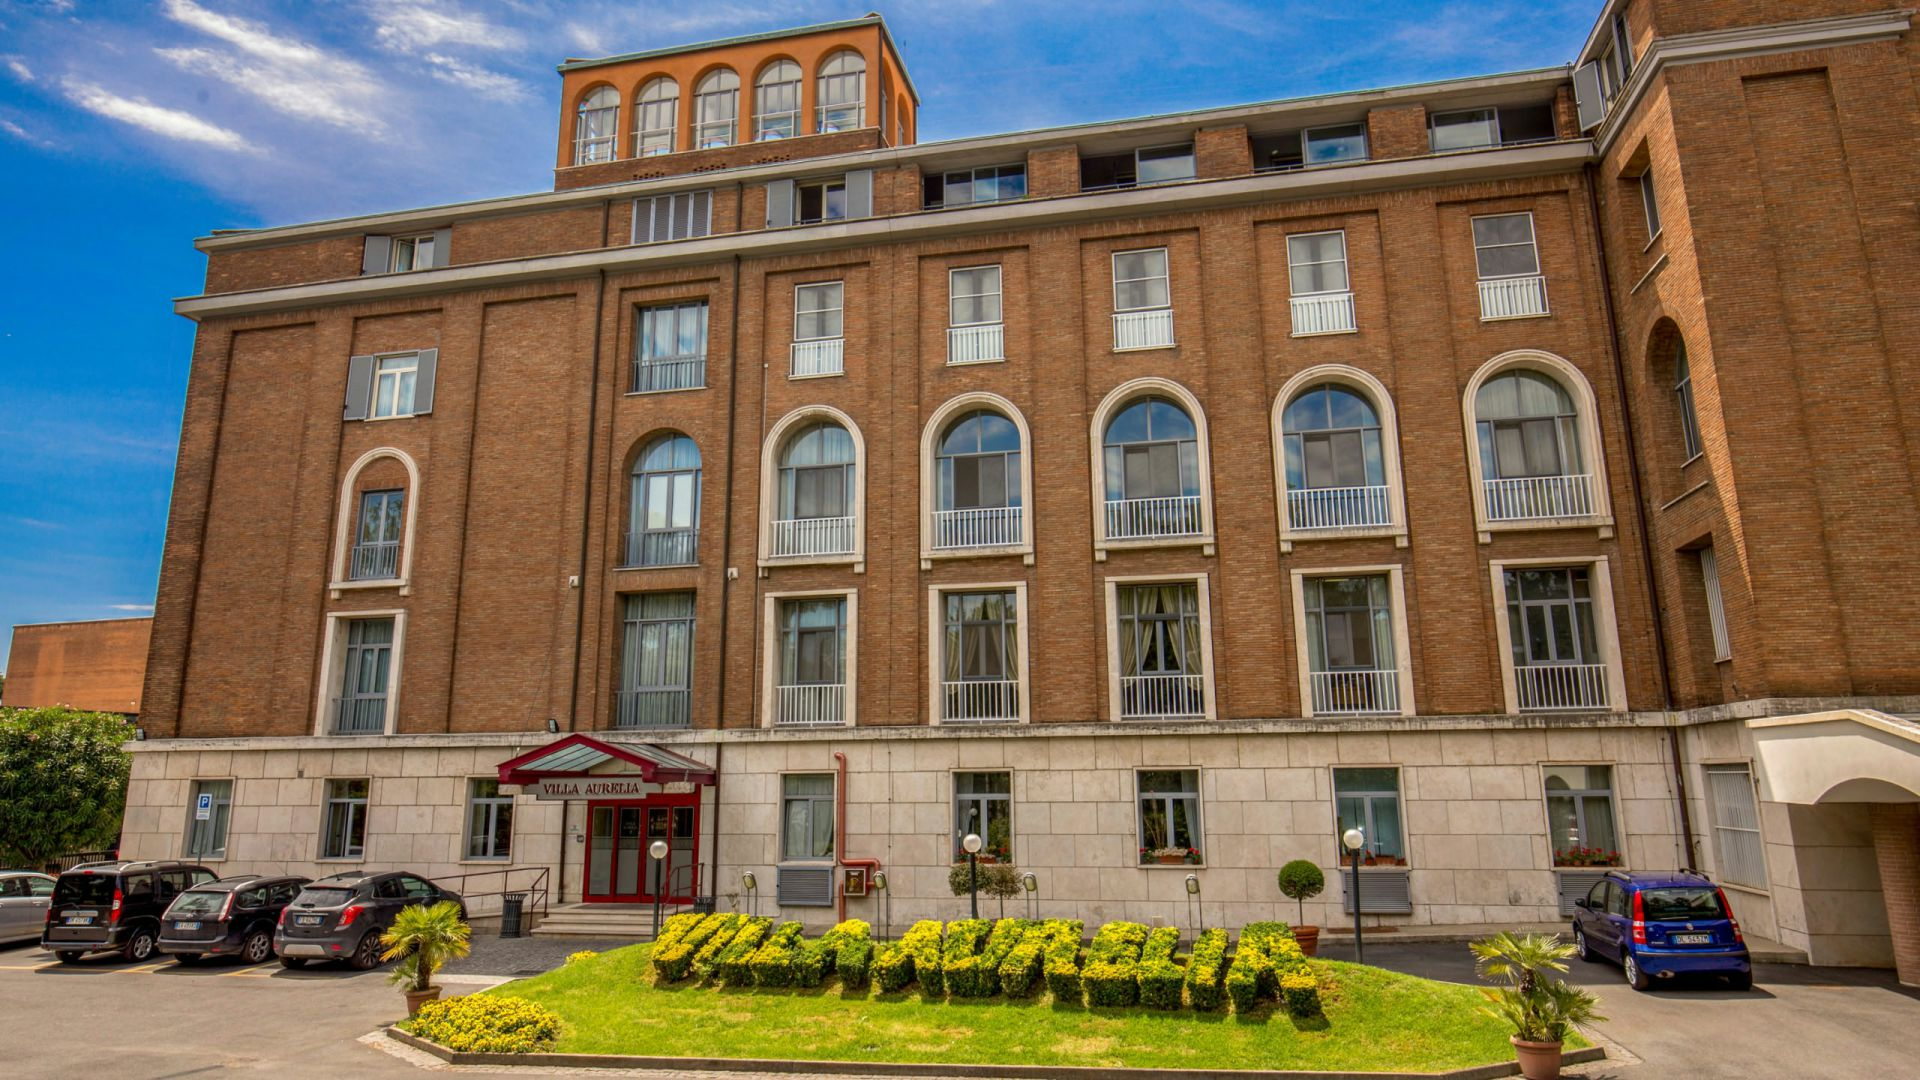 villa-aurelia-hotel-3320